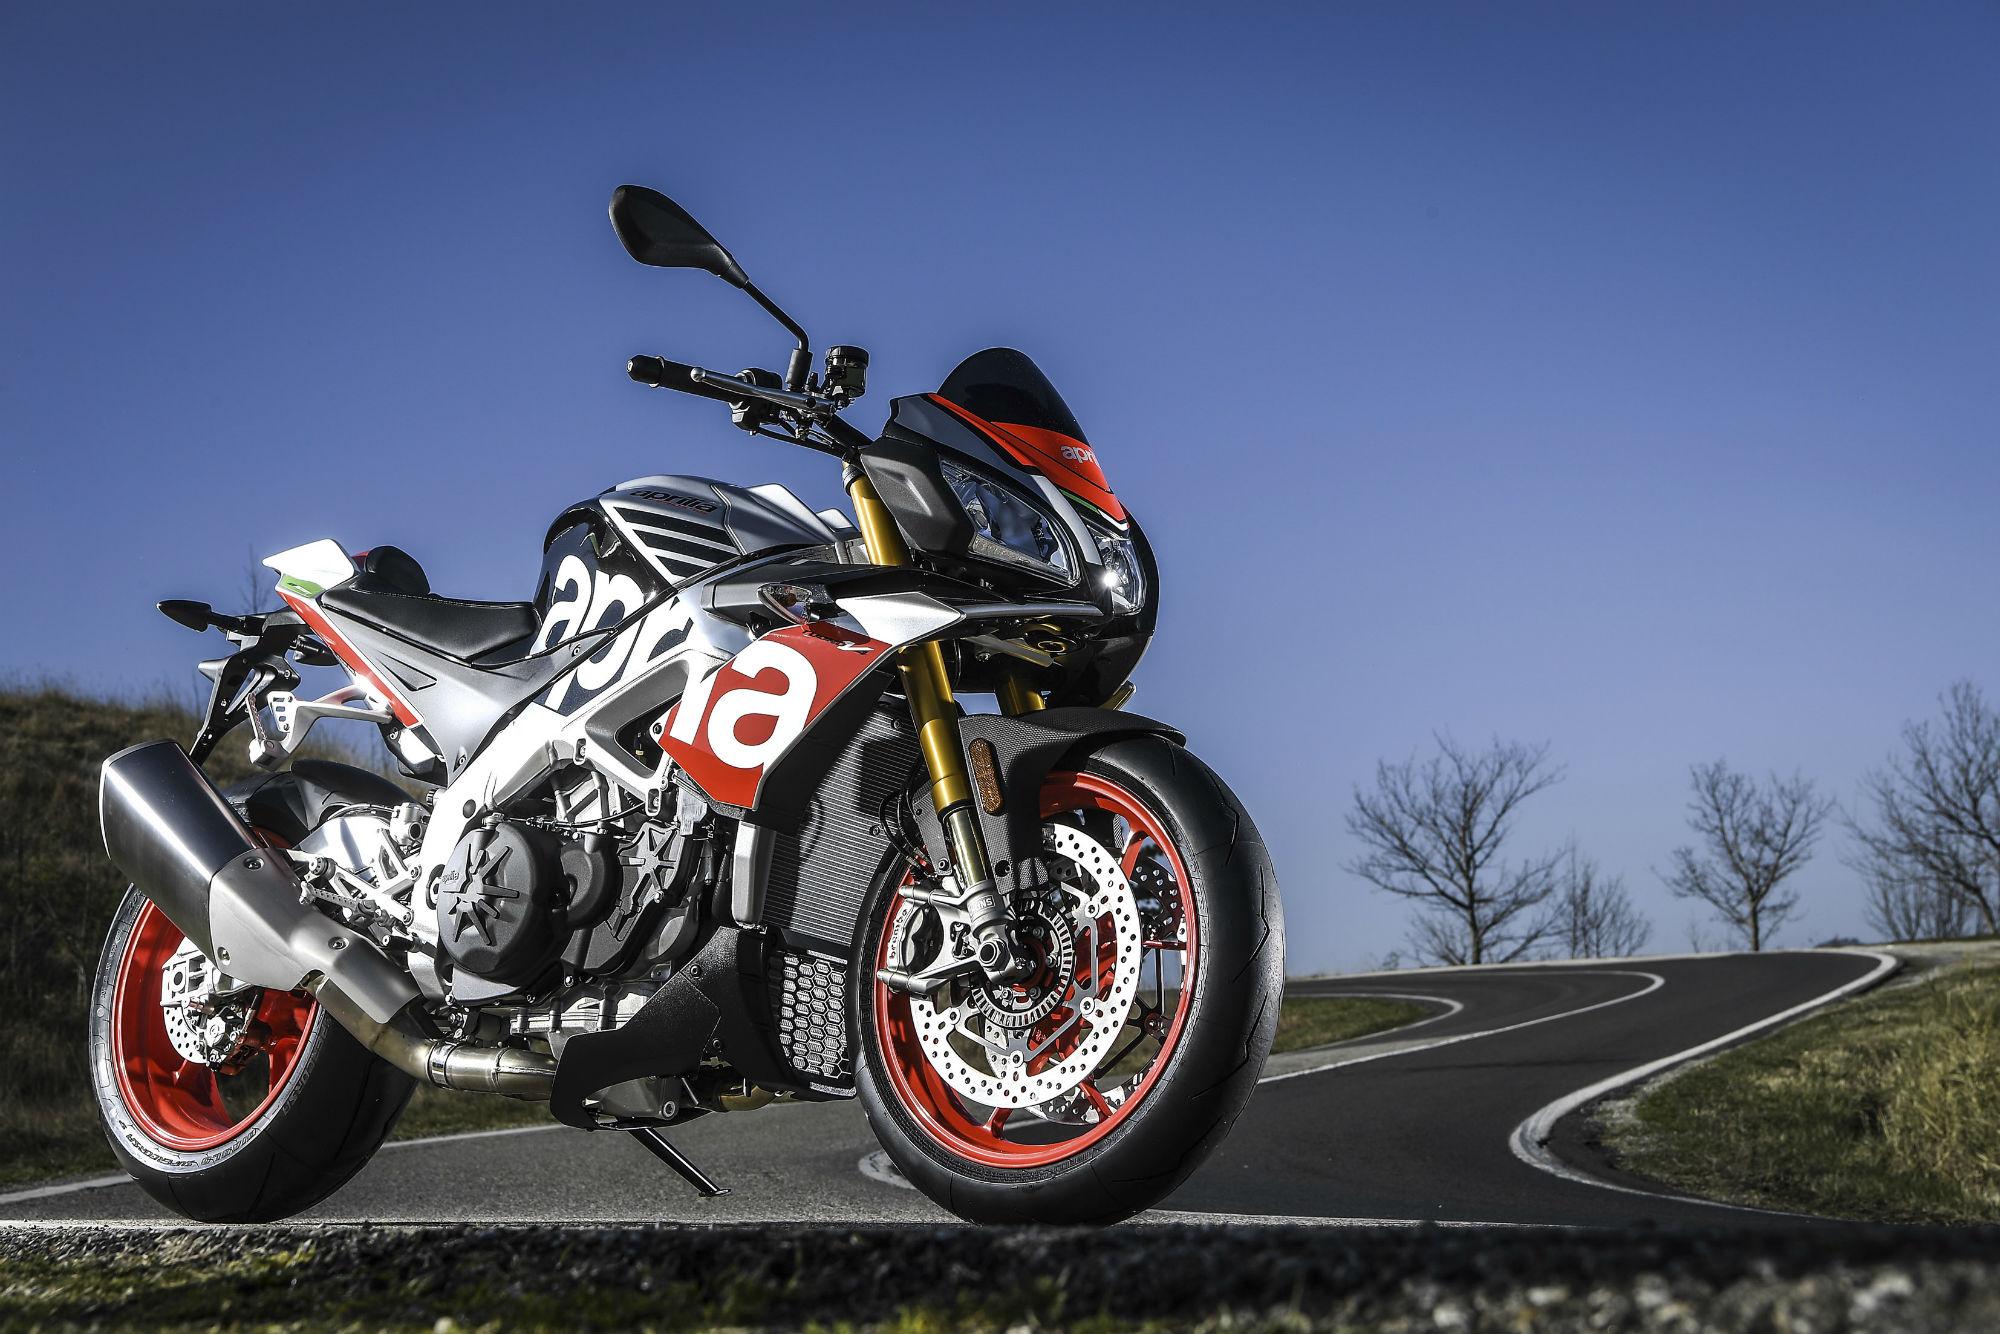 Ducati Panigale, Suzuki GSX-R1000, Aprilia RSV4 1000 recalled